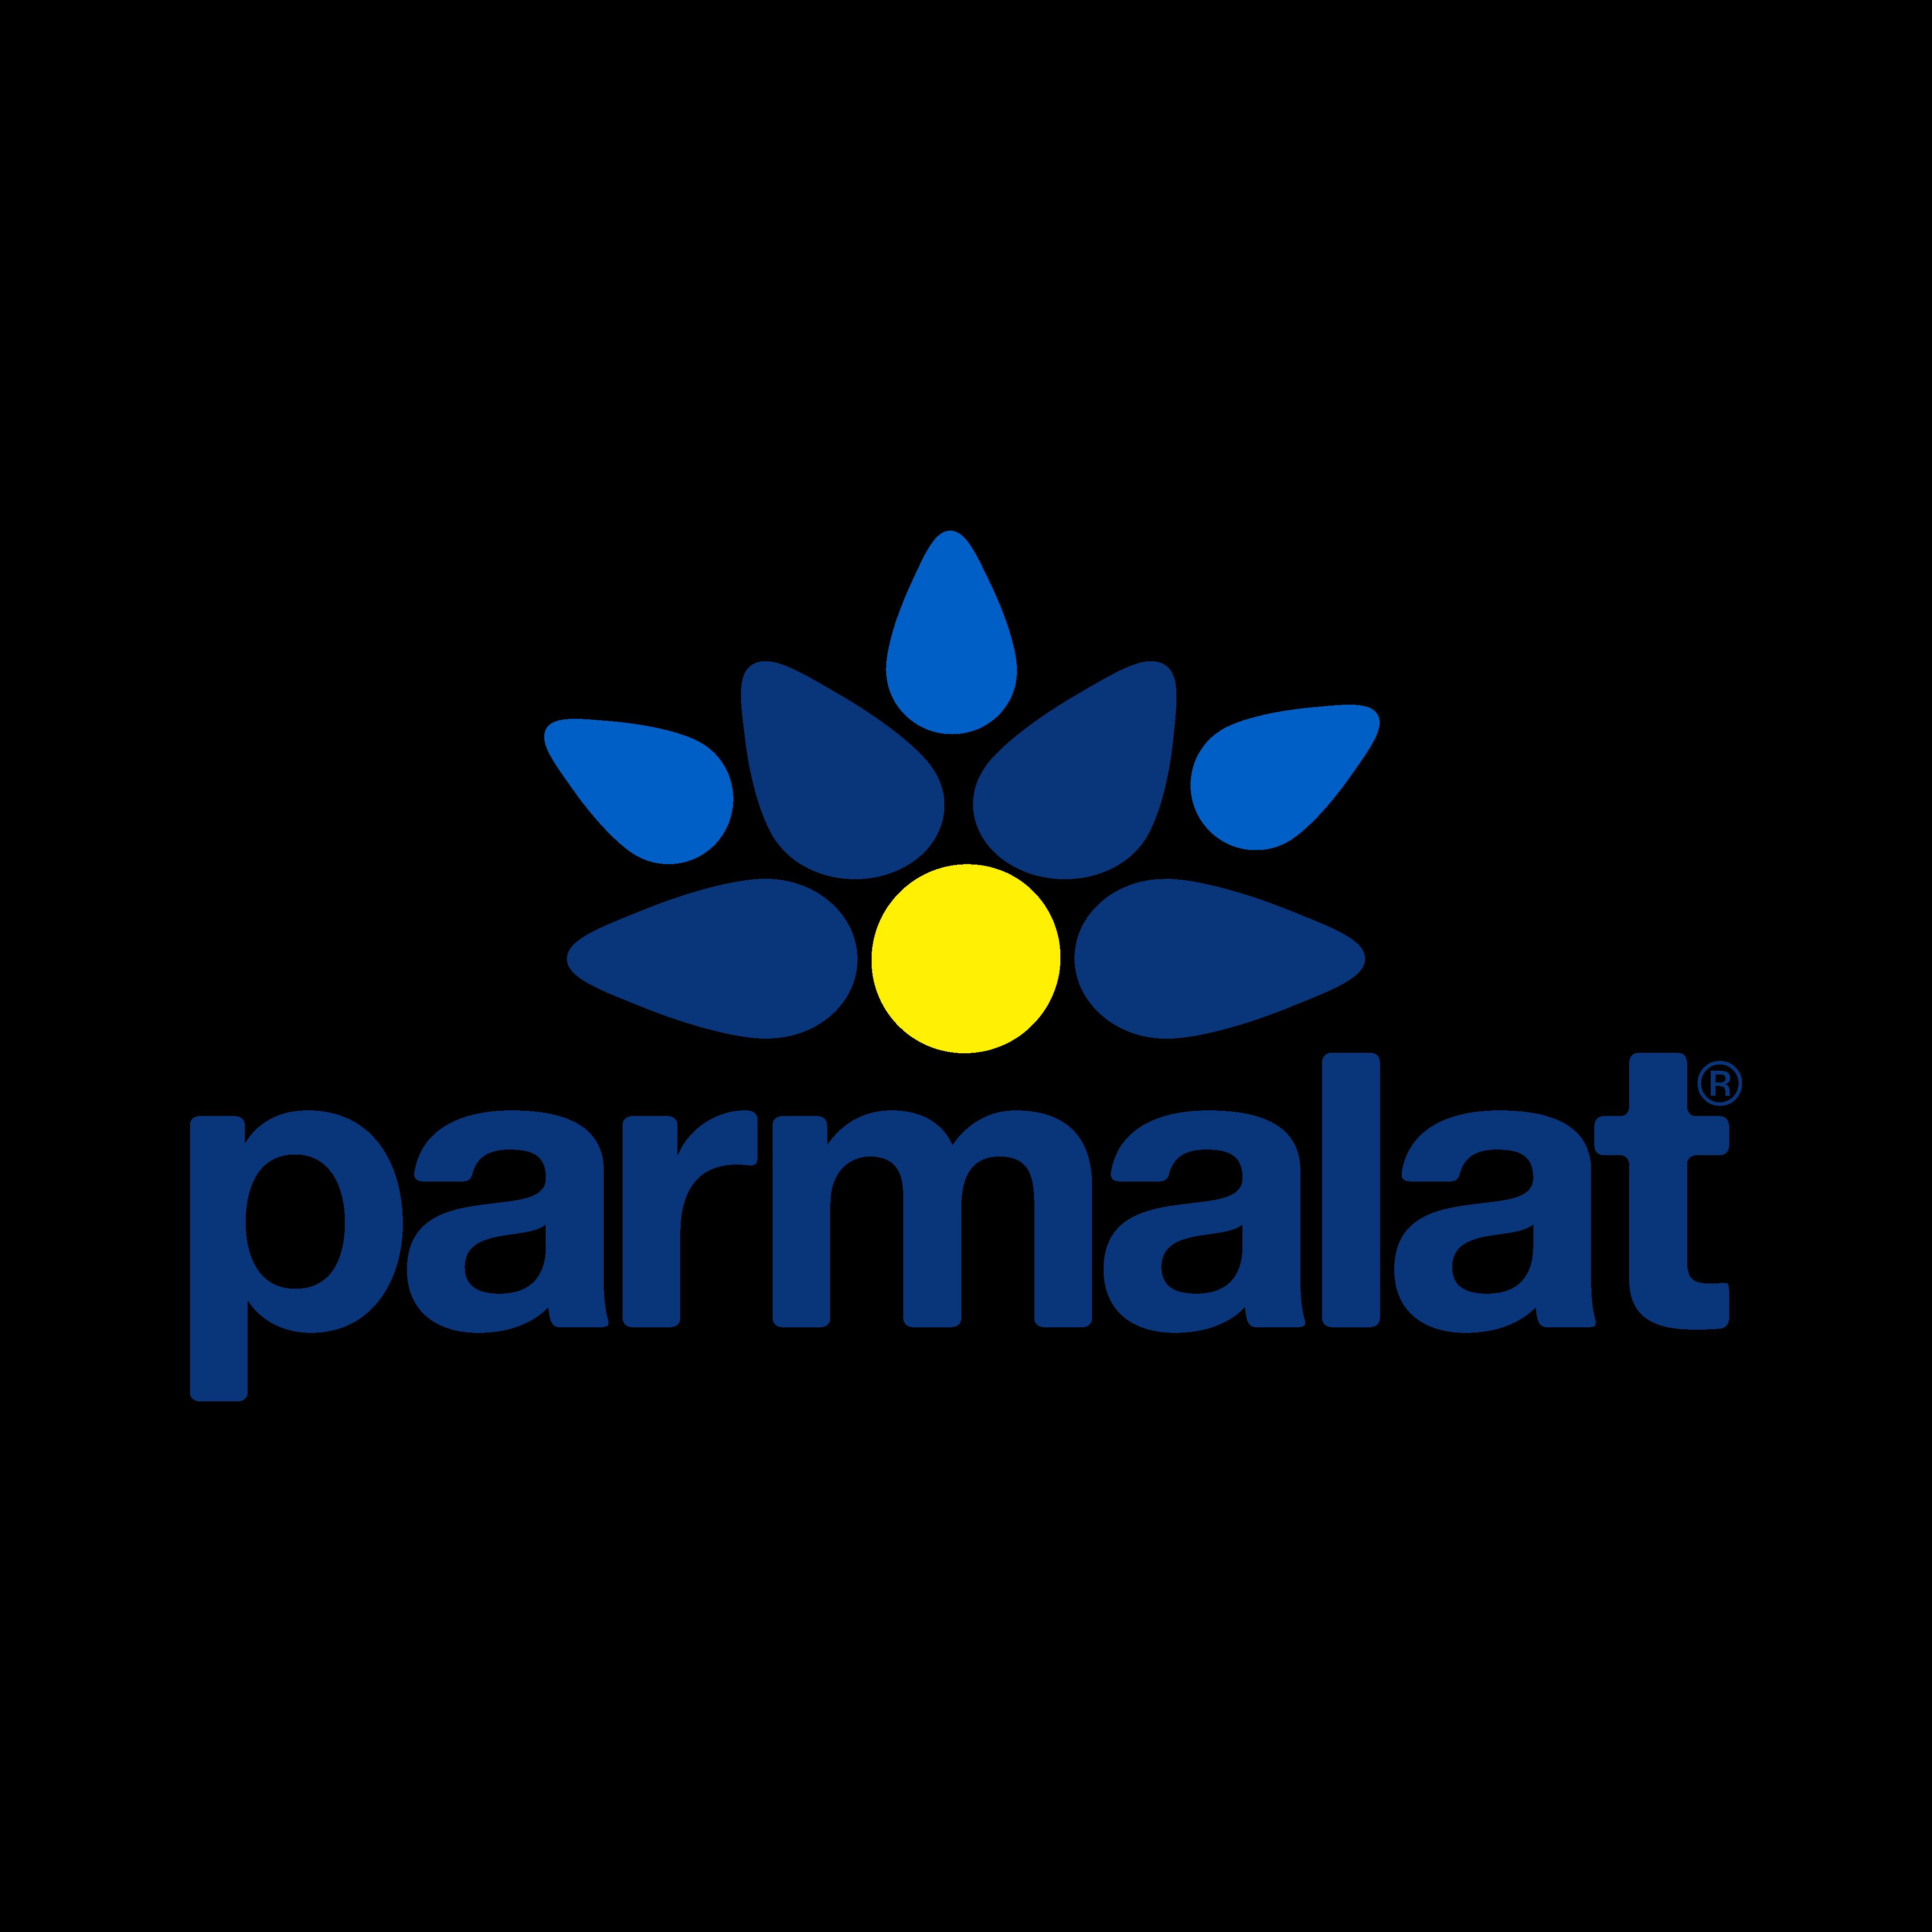 parmalat logo 0 - Parmalat Logo